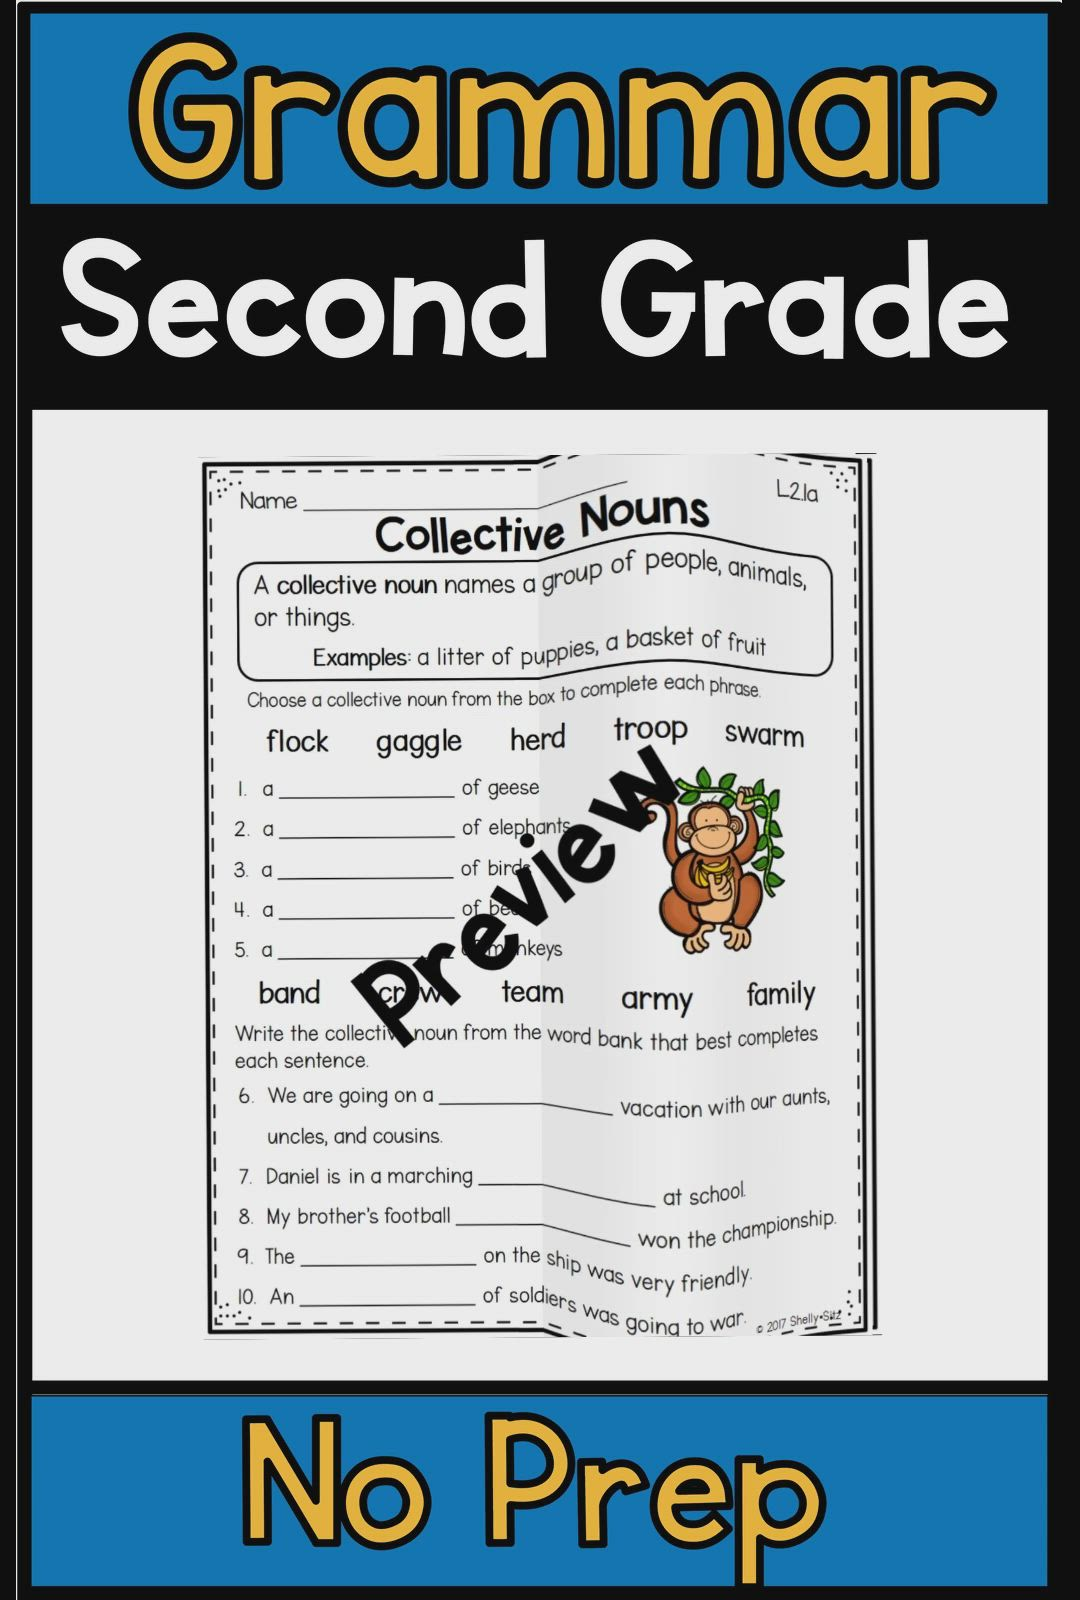 Predownload: Grammar Worksheets For Second Grade Distance Learning Video Video Grammar Skills Second Grade Grammar [ 1600 x 1080 Pixel ]